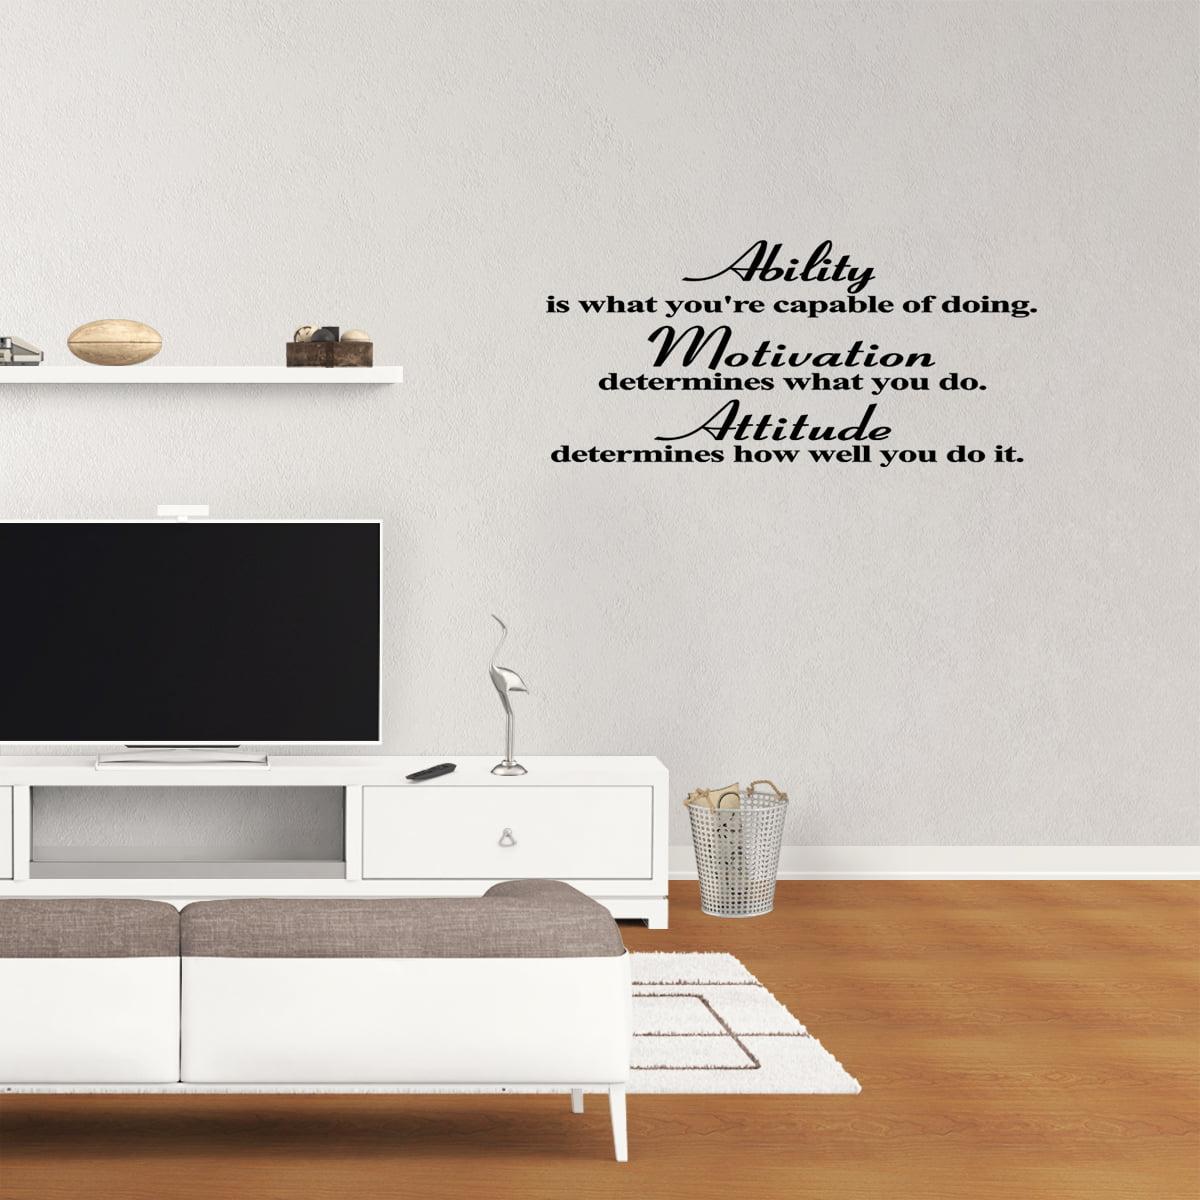 Attitude Ability Vinyl Wall Decal Quote Inspirational Sticker Art Home Decor 45